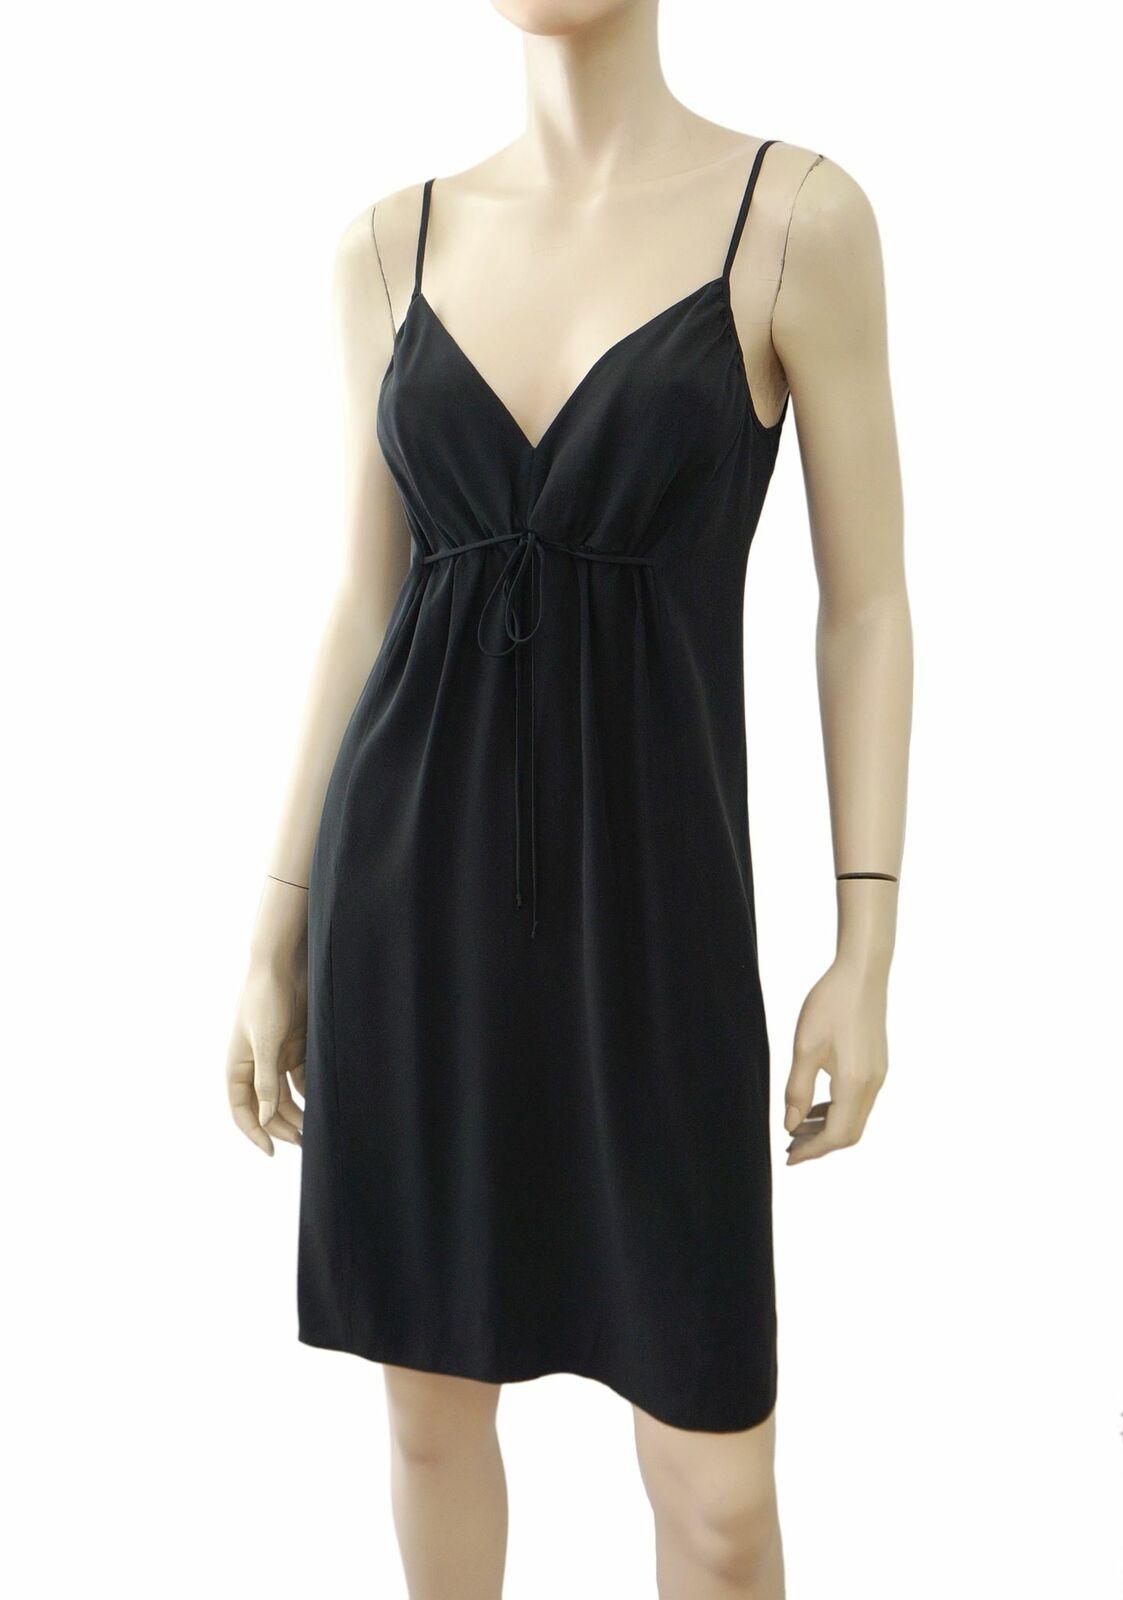 TWELFTH STREET BY CYNTHIA VINCENT schwarz Washed Silk Slip Dress P NEW